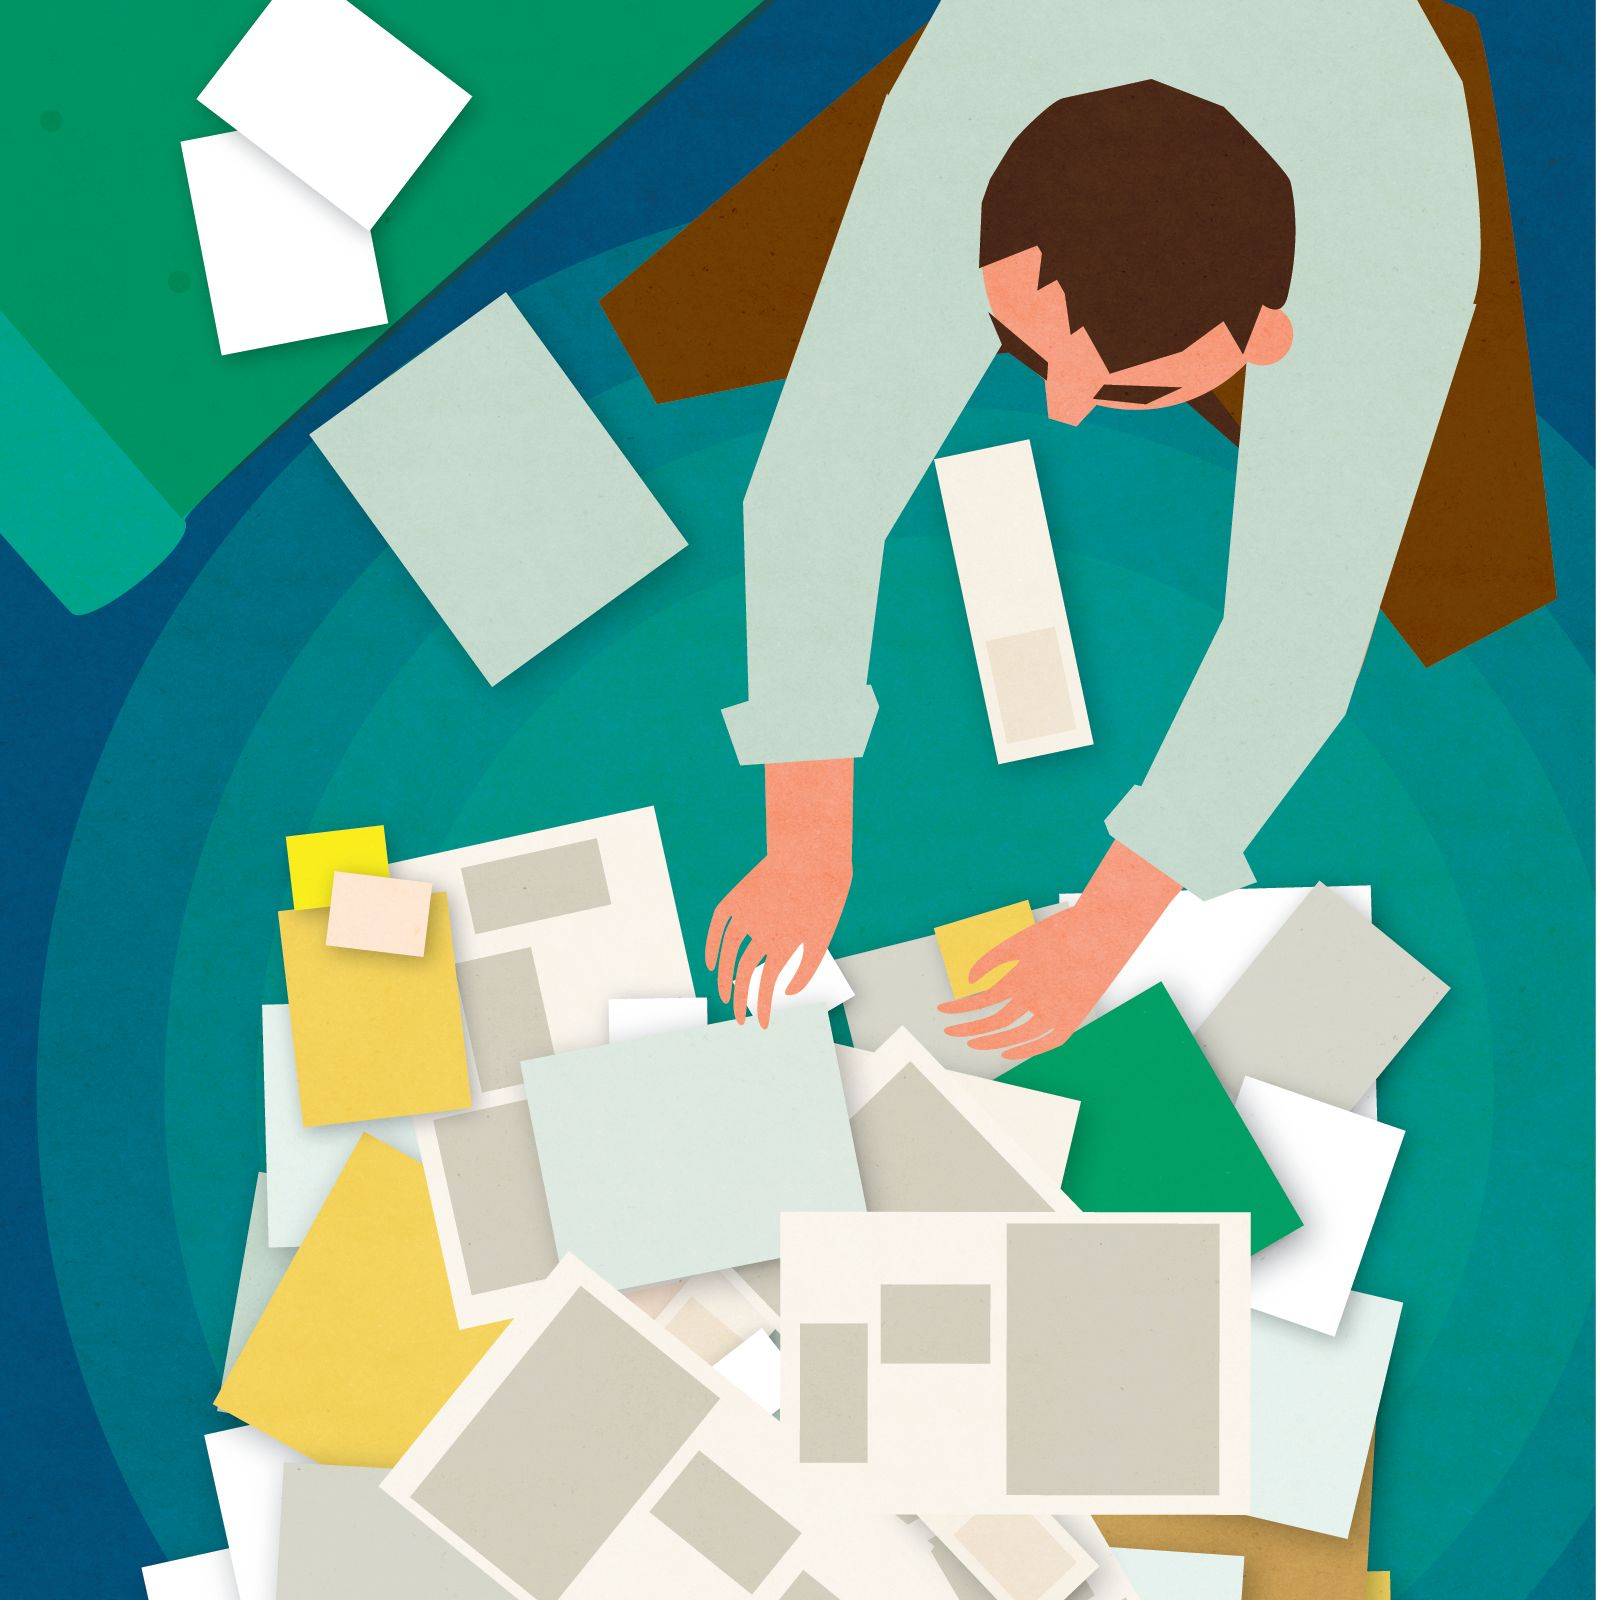 Pomo 0816 amateur historian illustration pxnkfx